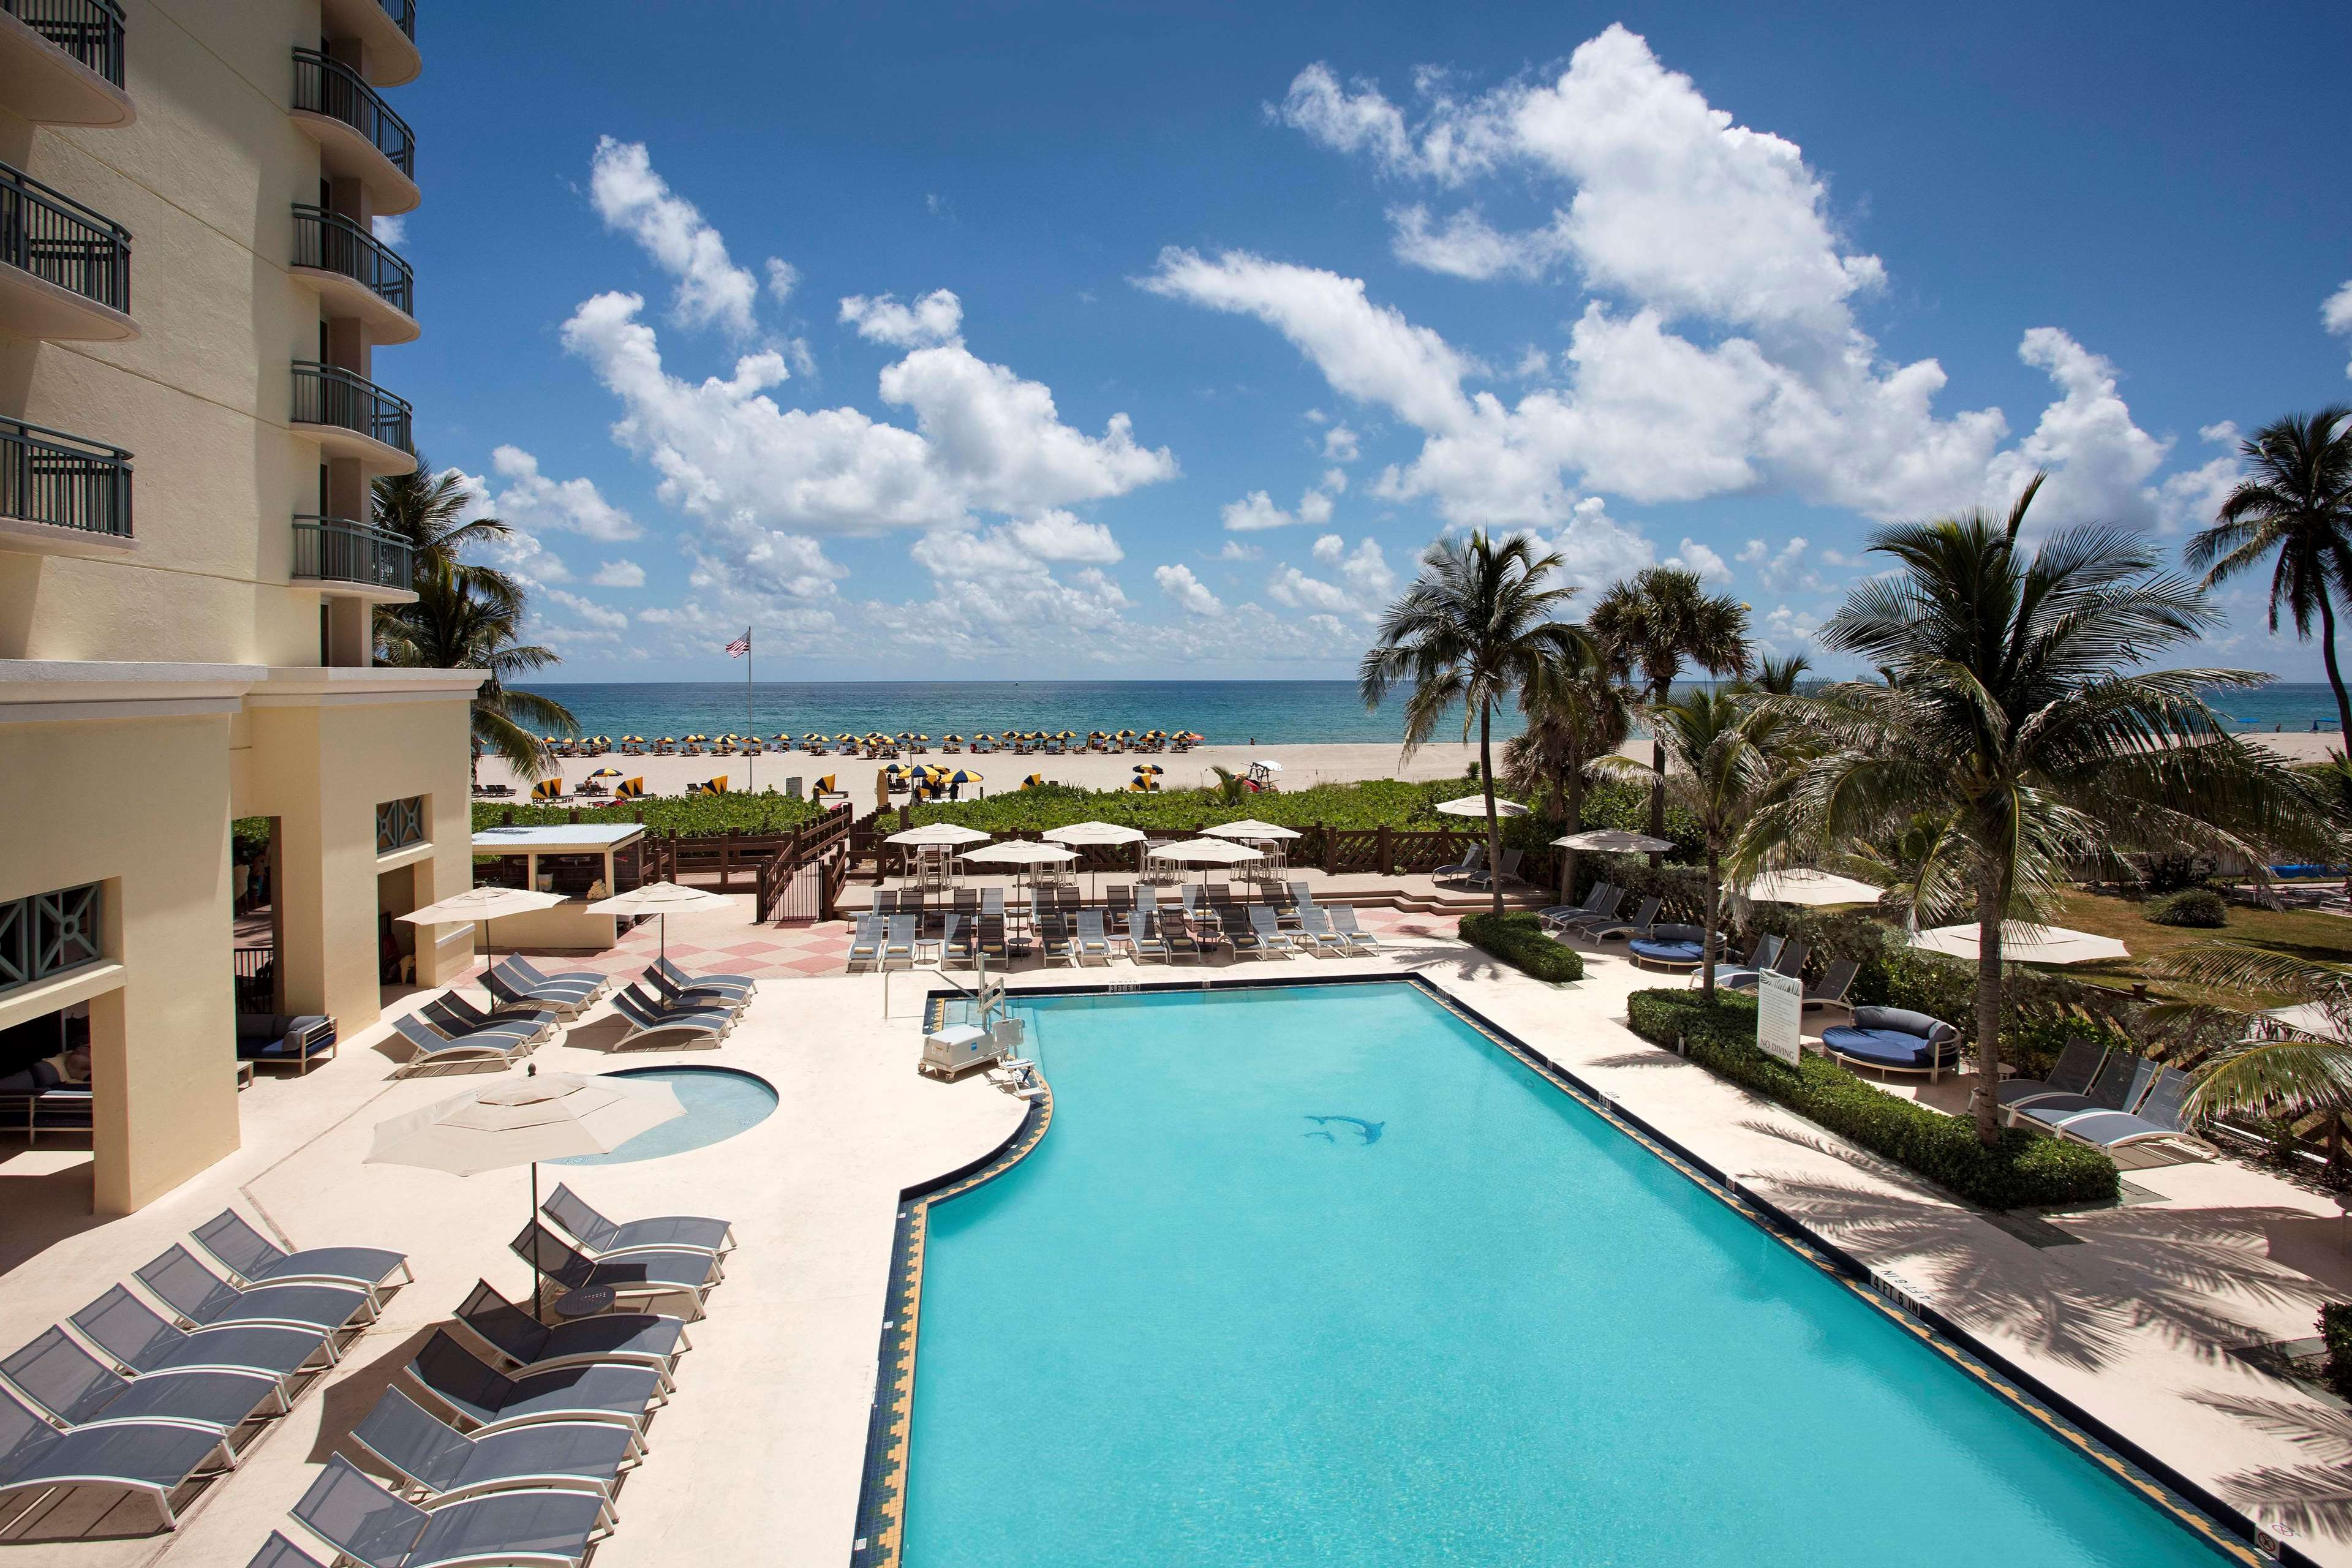 Hilton Singer Island Oceanfront/Palm Beaches Resort image 48